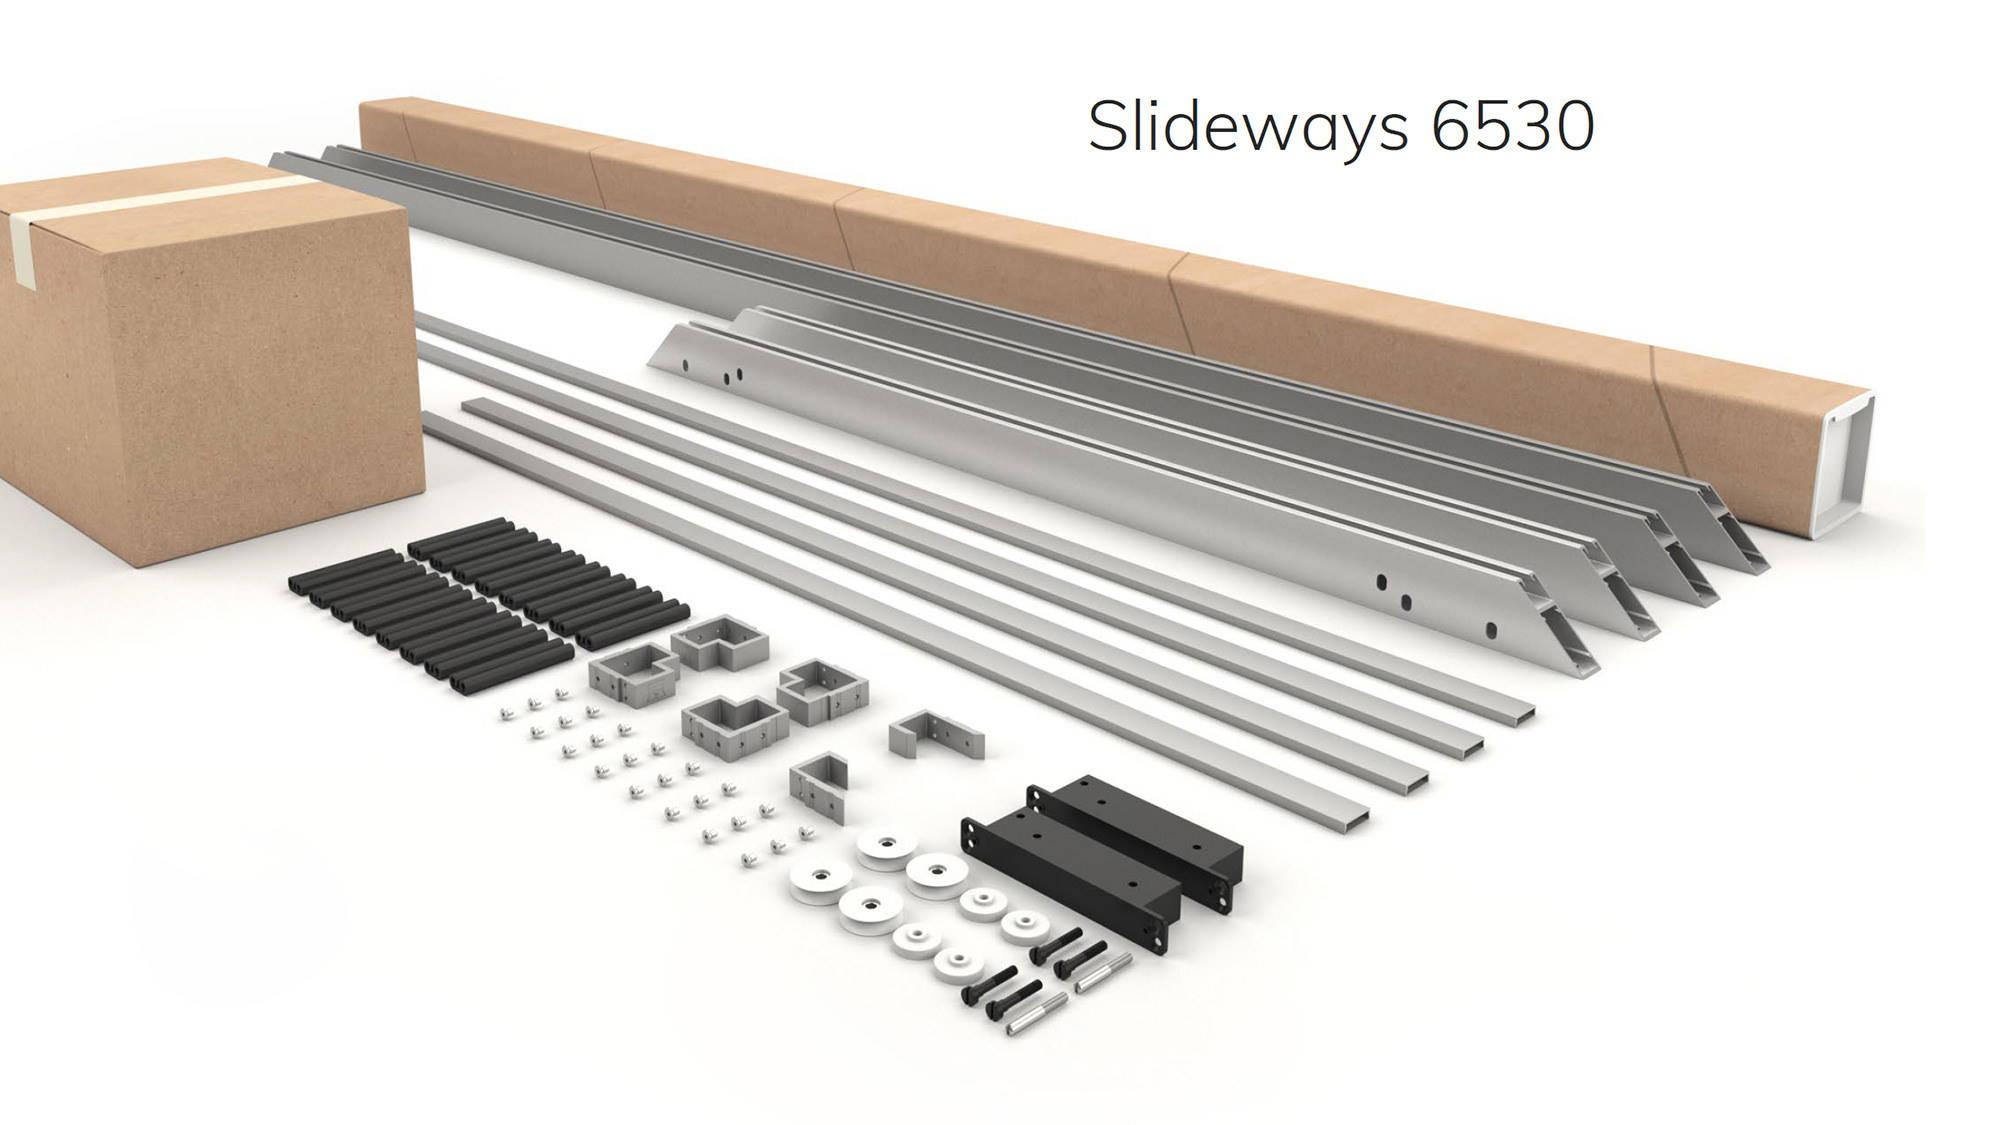 Slideways 6530 self-assembly kit